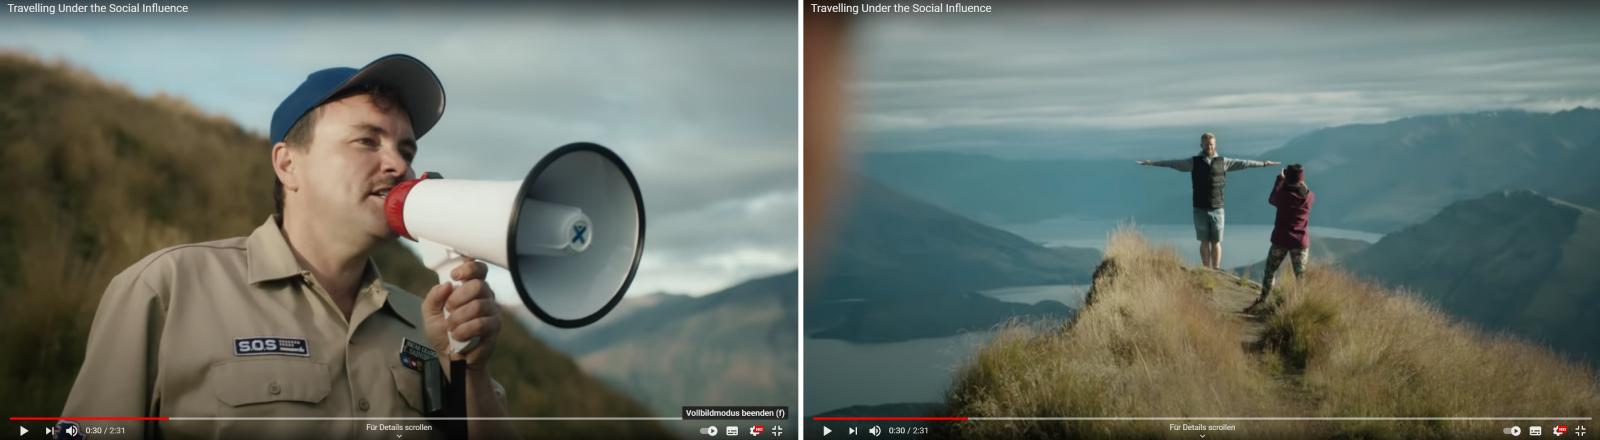 "Ranger versus Social-Touris: Szenen aus dem Video ""Travelling Under the Social Influence"""